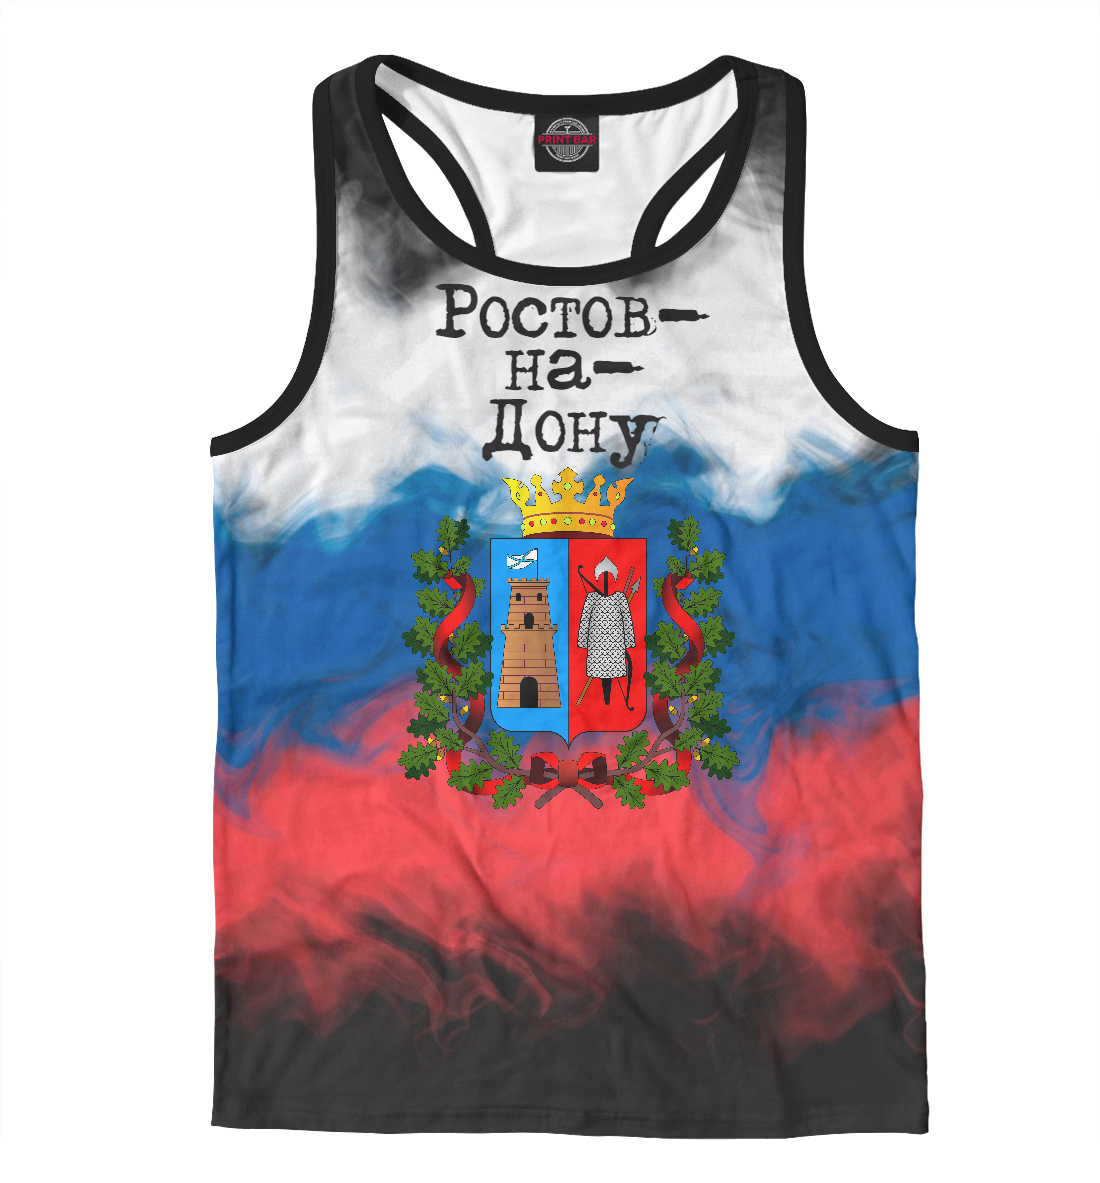 Купить Ростов-на-Дону, Printbar, Майки борцовки, VSY-605708-mayb-2